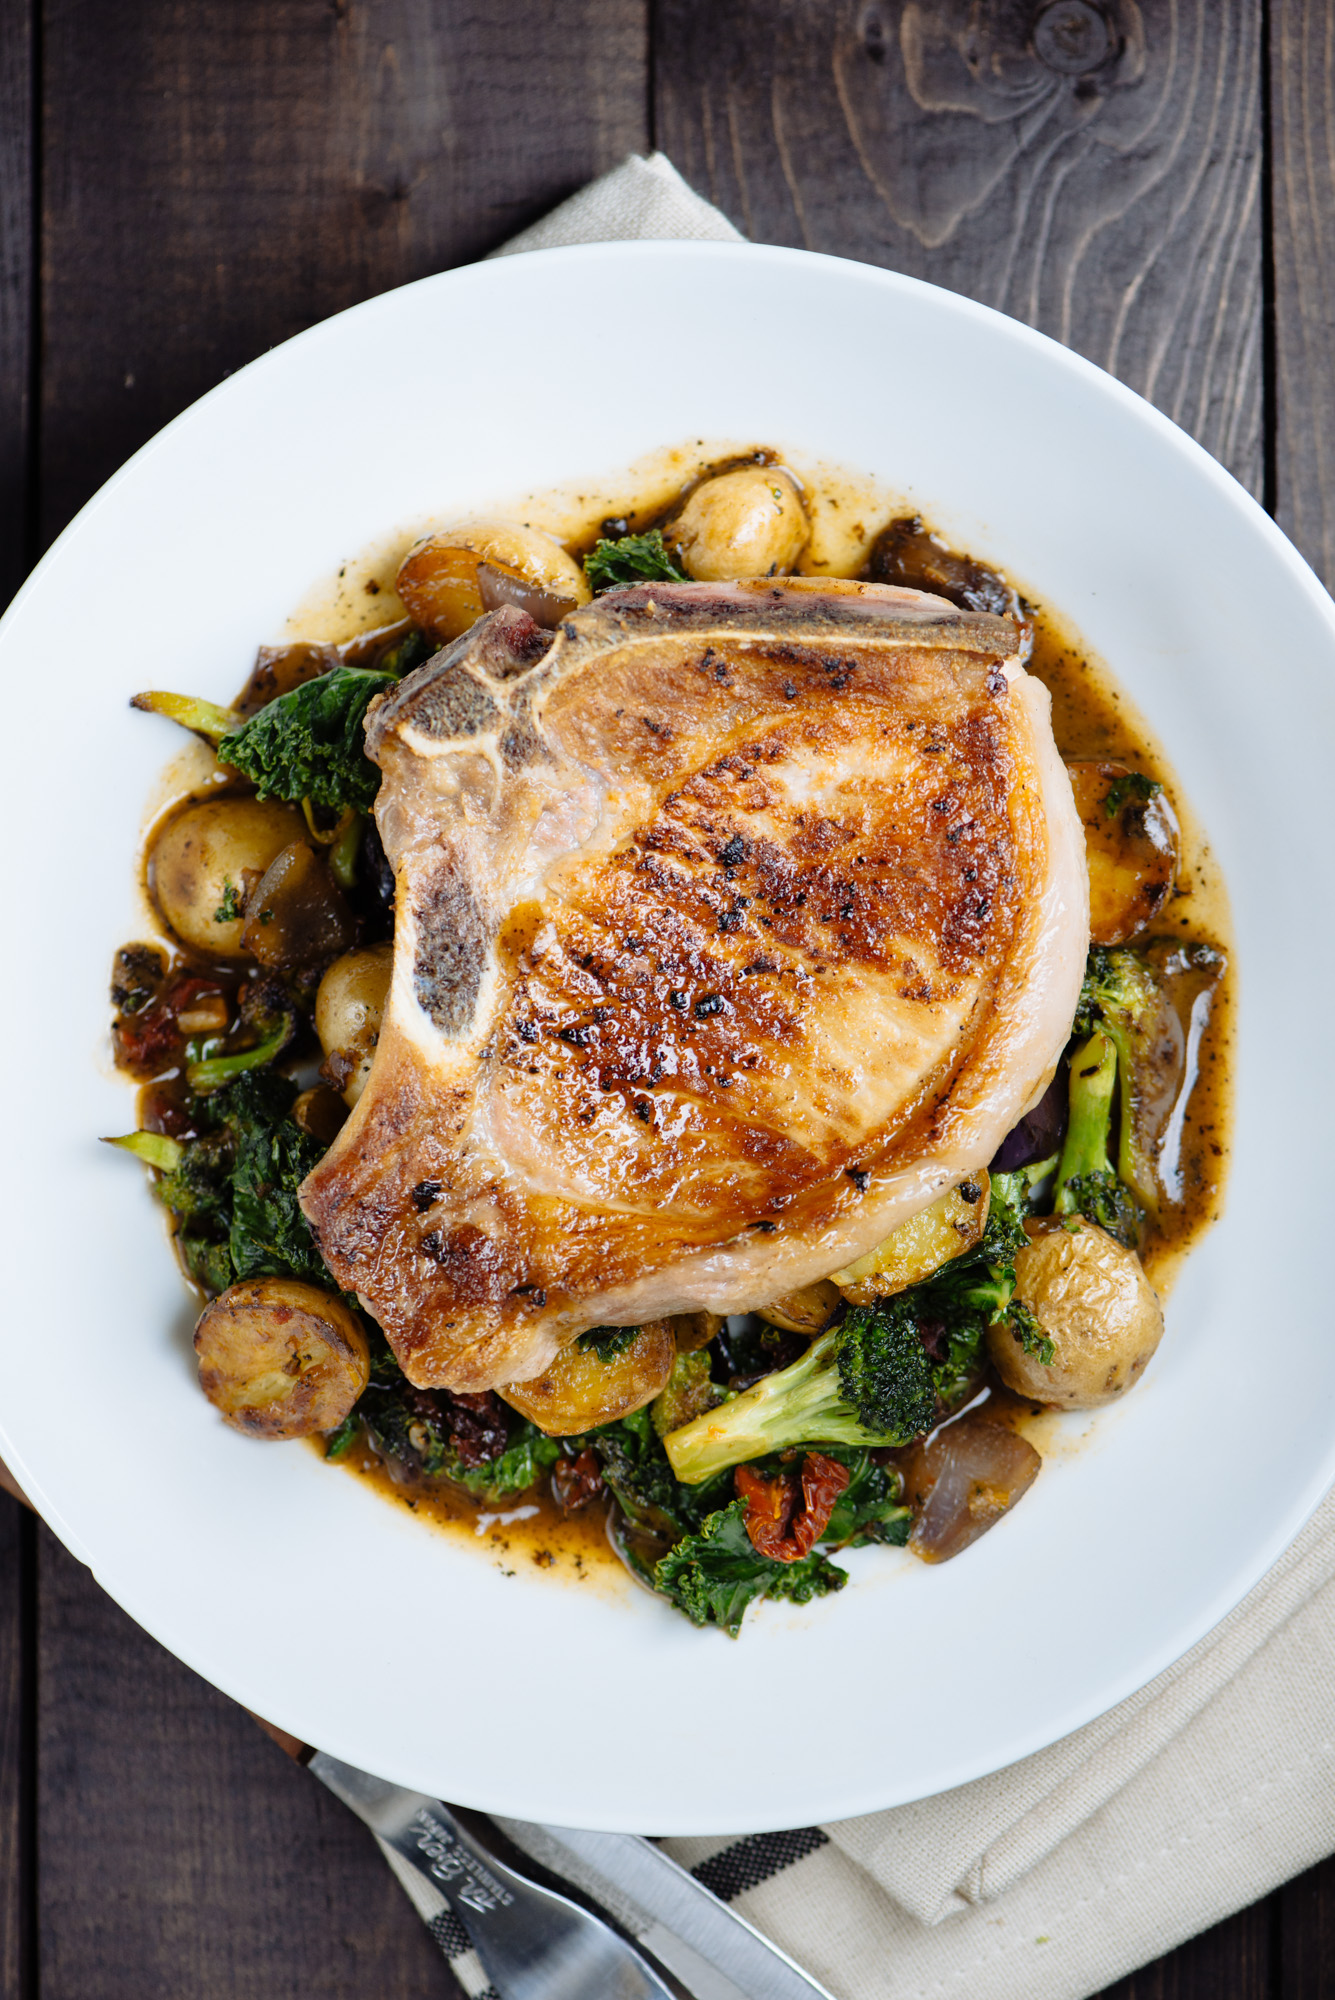 Pan Roasted Pork Chop on Potato, Kale, & Broccoli with Pan Gravy | BS ...